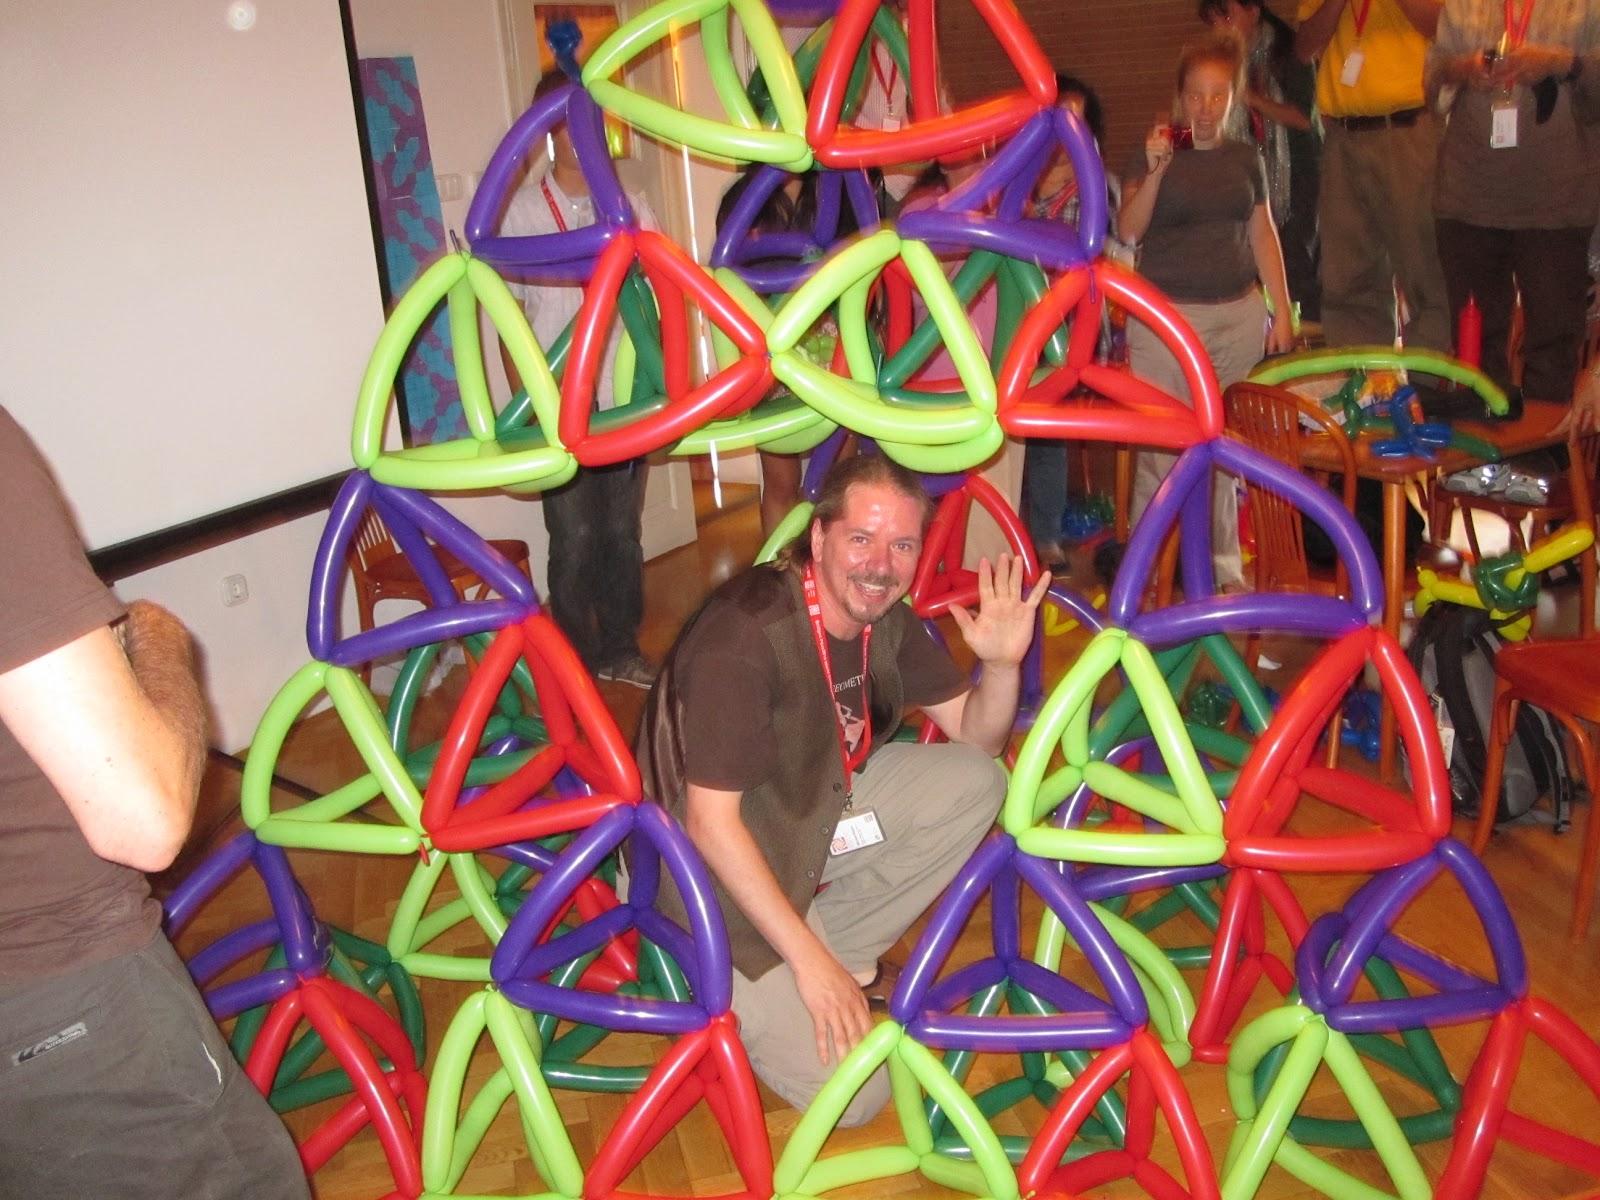 Mike Naylor Creative Mathematics July 2012